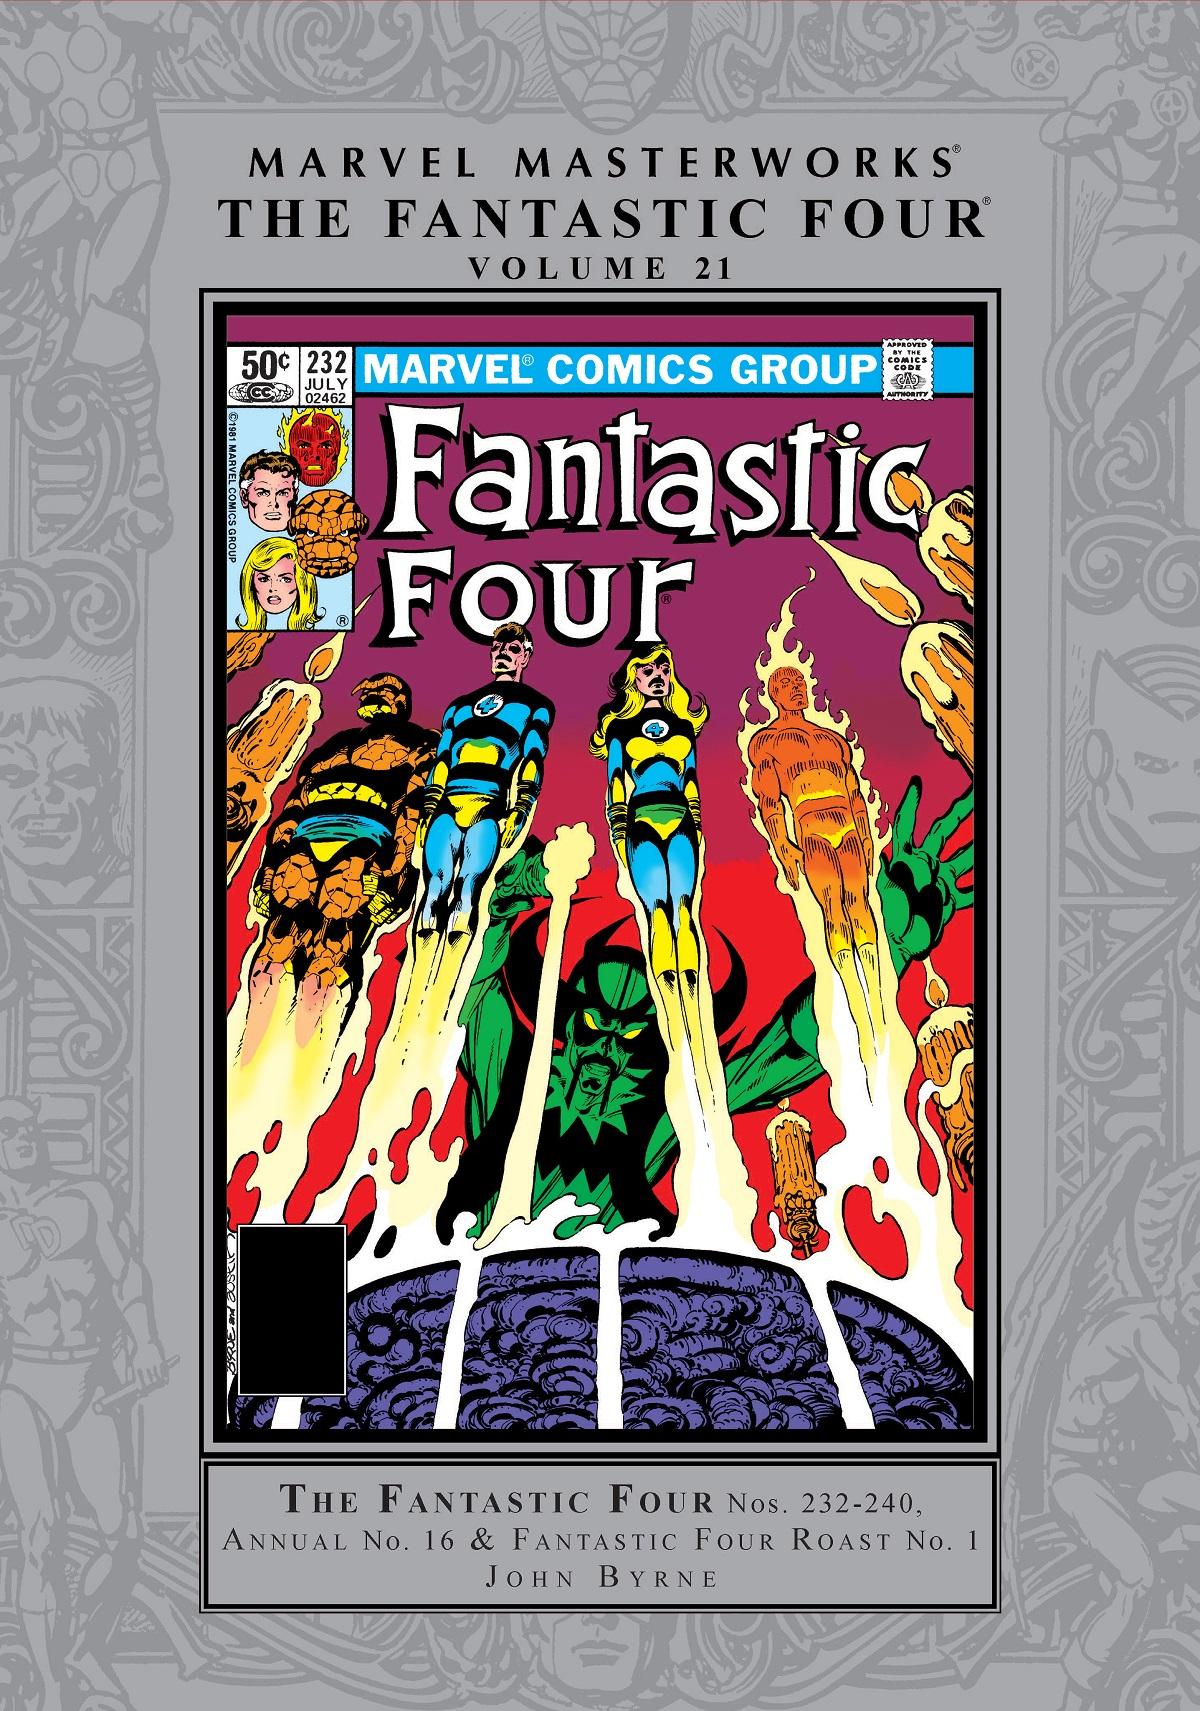 Marvel Masterworks: The Fantastic Four Vol. 21 (Hardcover)